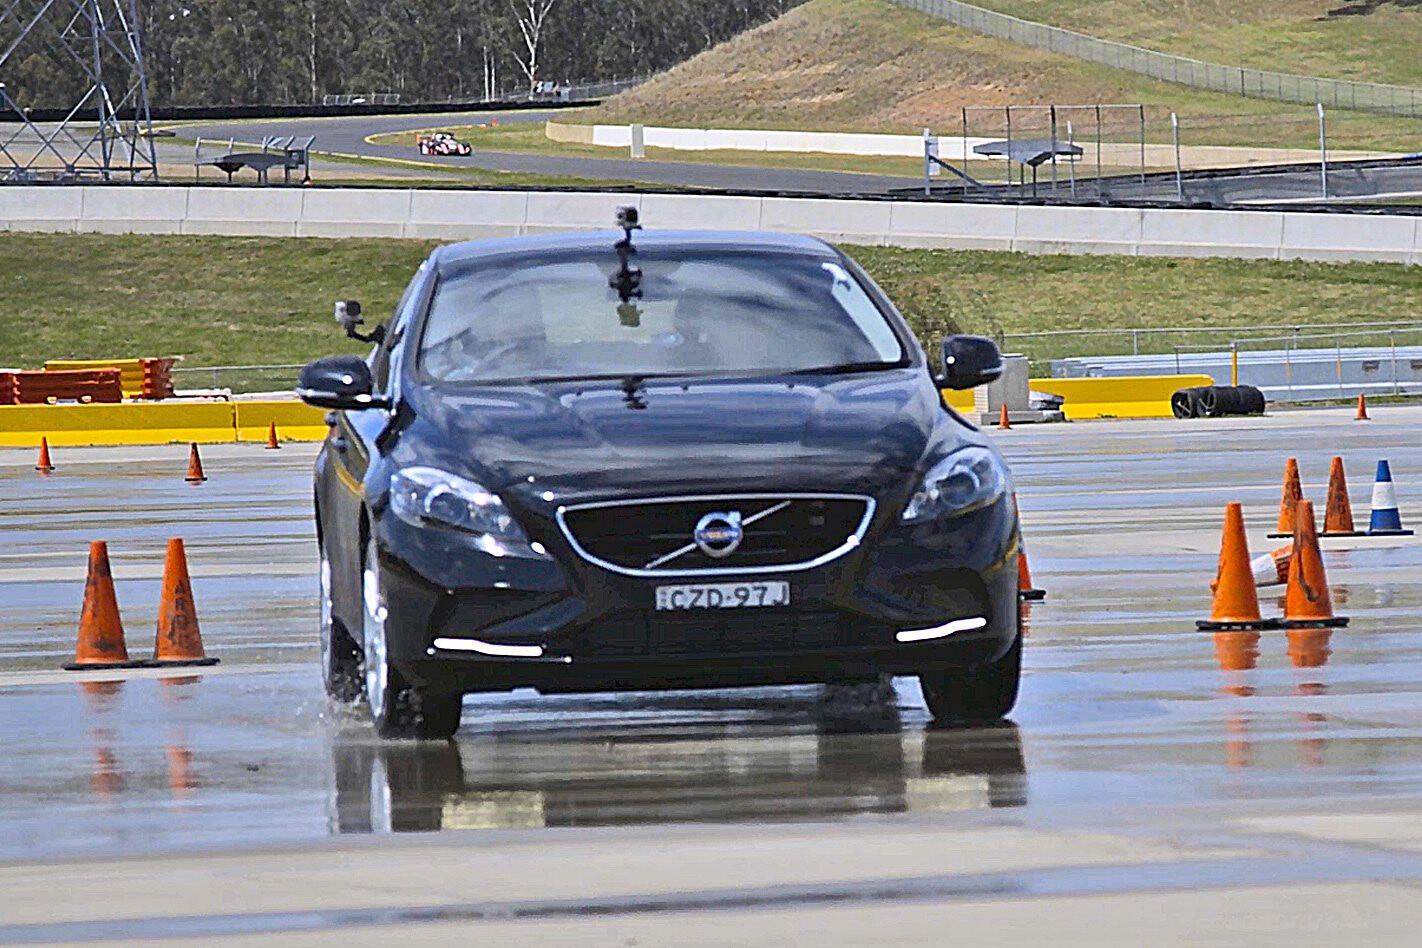 Volvo V 40 Taking Driving Course Jpg